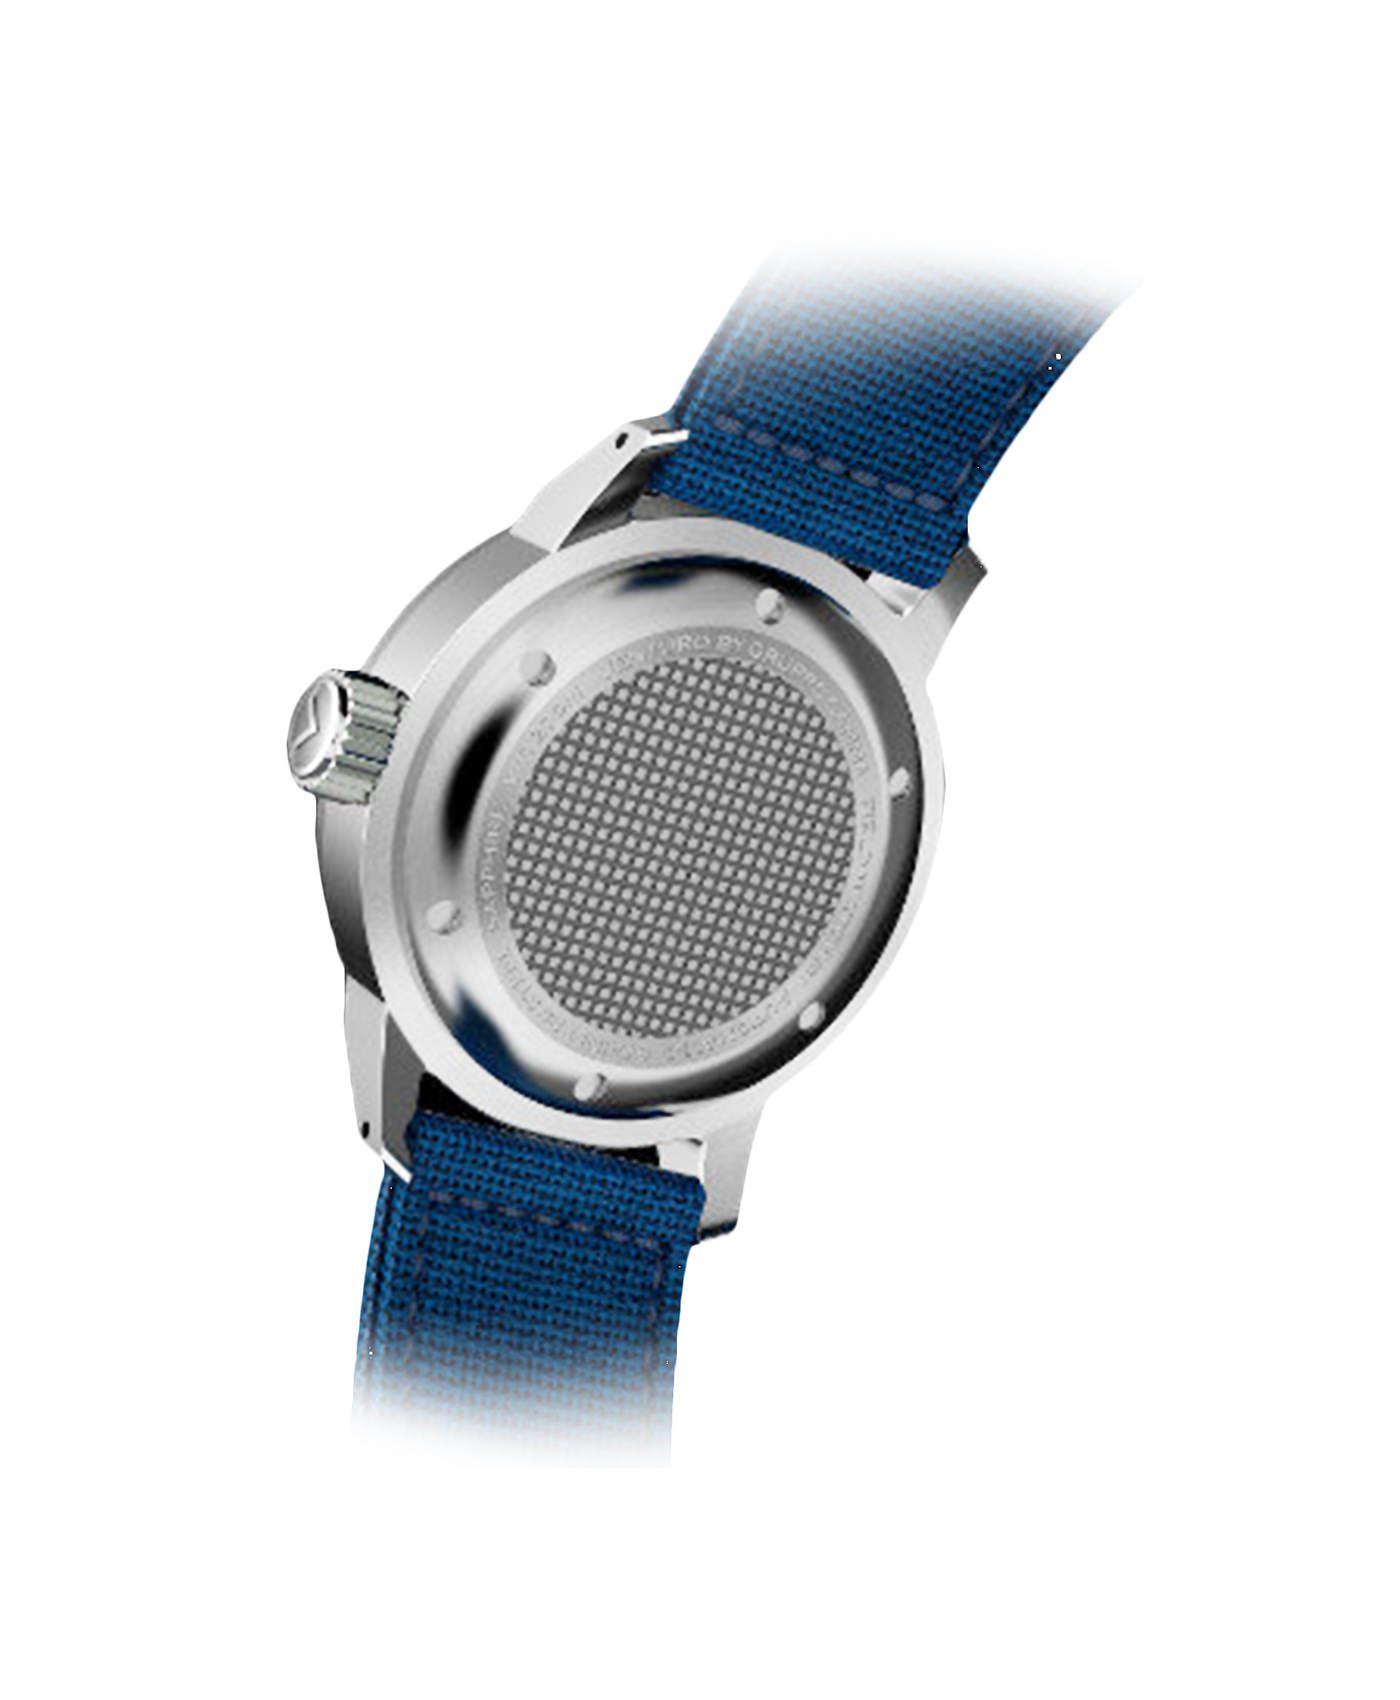 WB_Venturo - Field Watch - Blue Dial - BGW9 markers-back